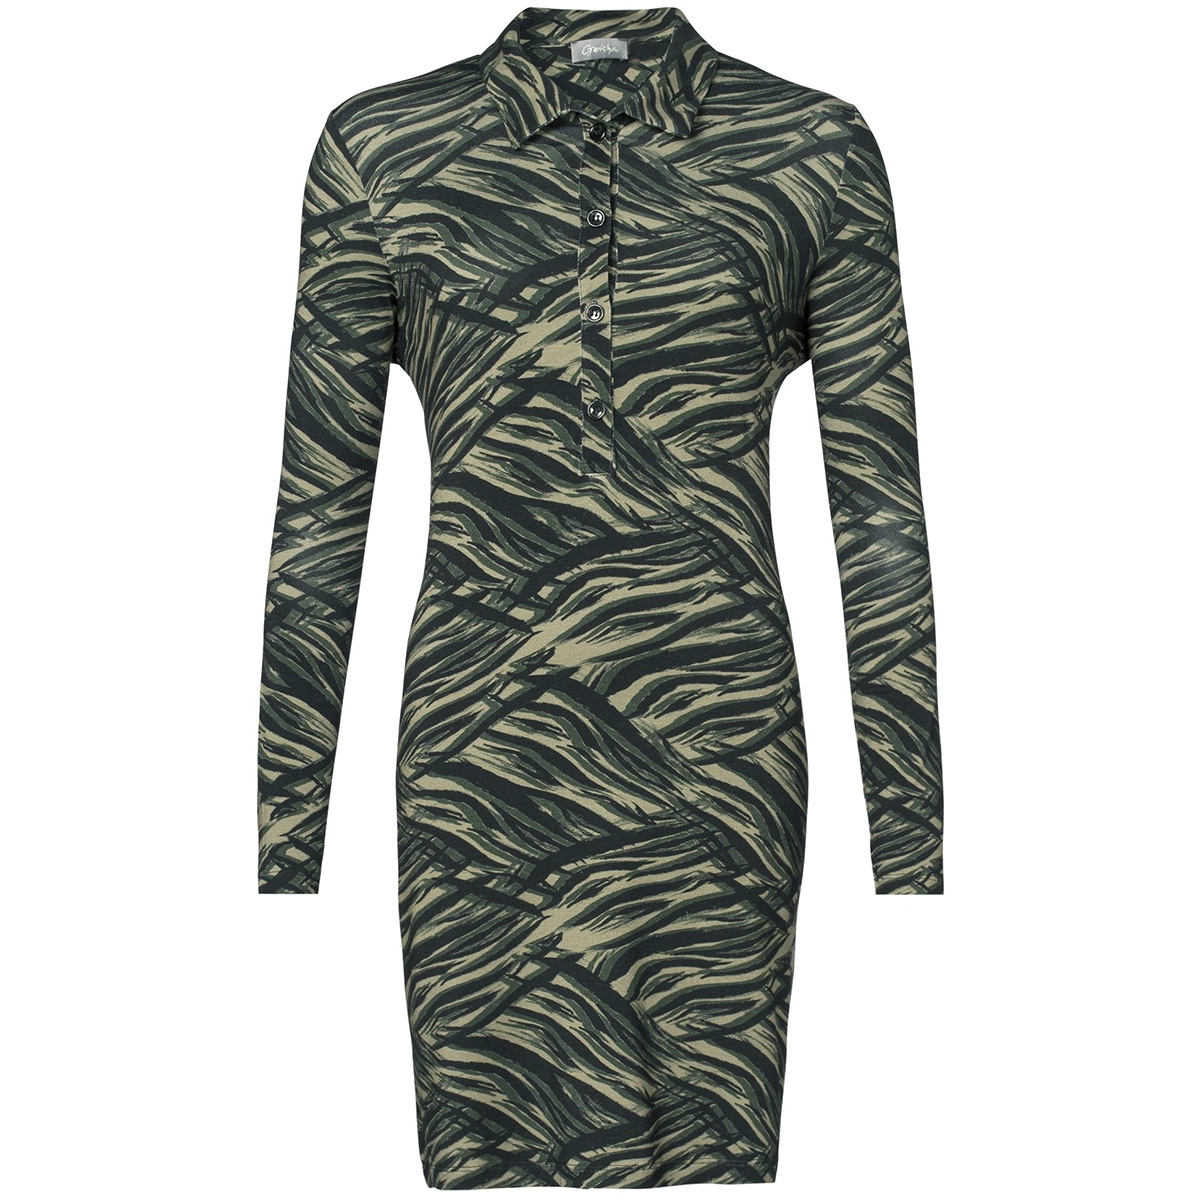 dress aop zebra 97871 geisha jurk army comb